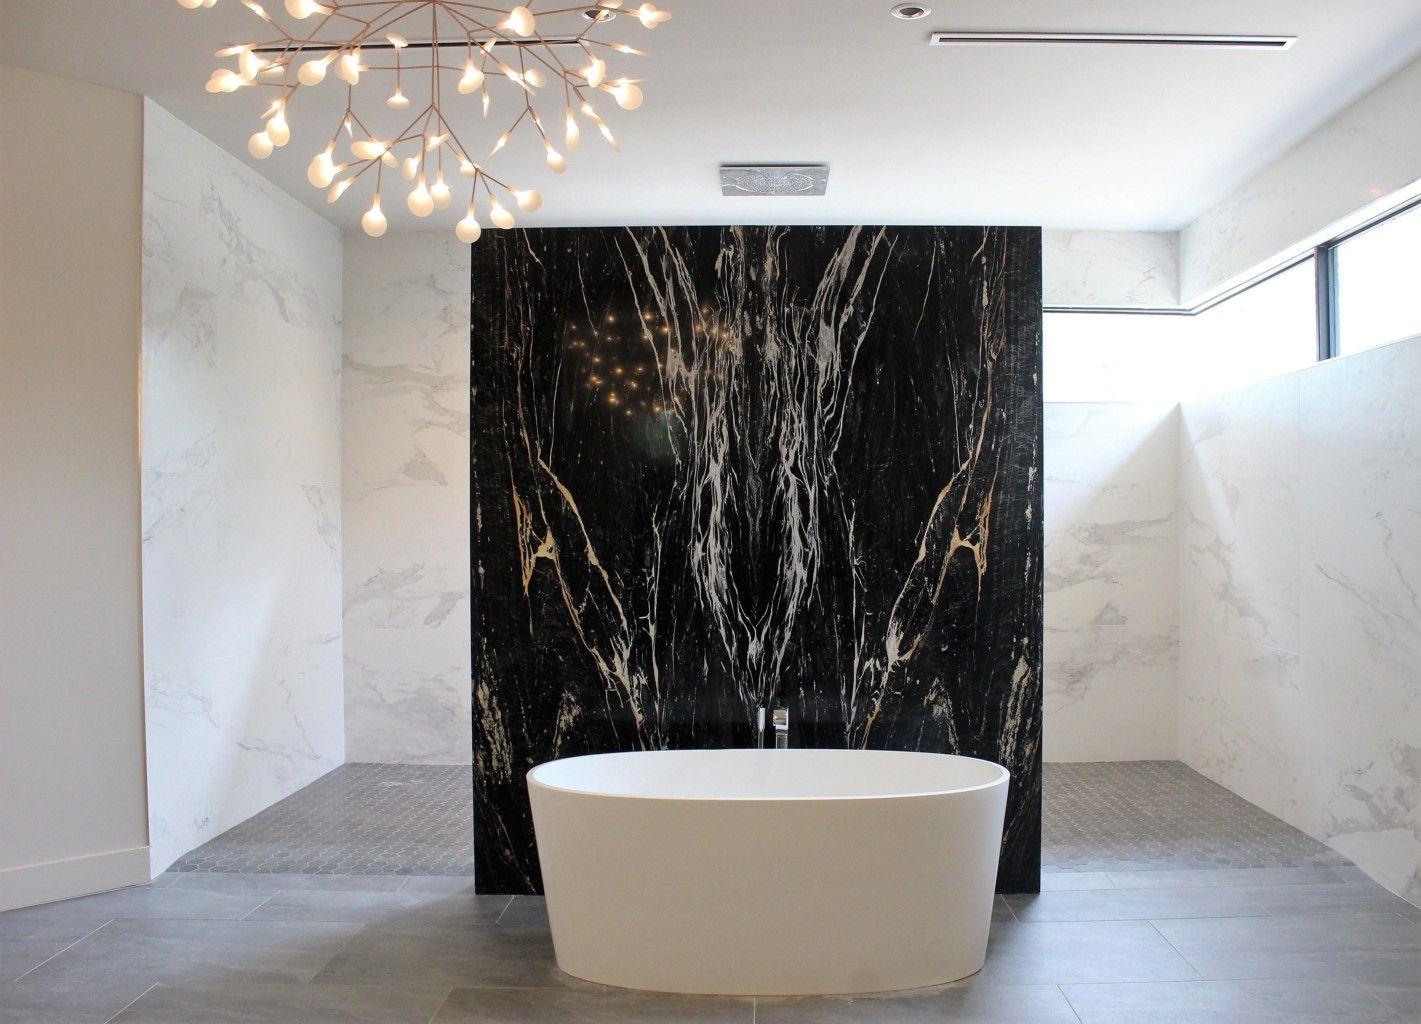 Zebrino Black And Gold Marble Bathroom Feature Wall Bathroom Feature Wall Stone Feature Wall Black Bathroom